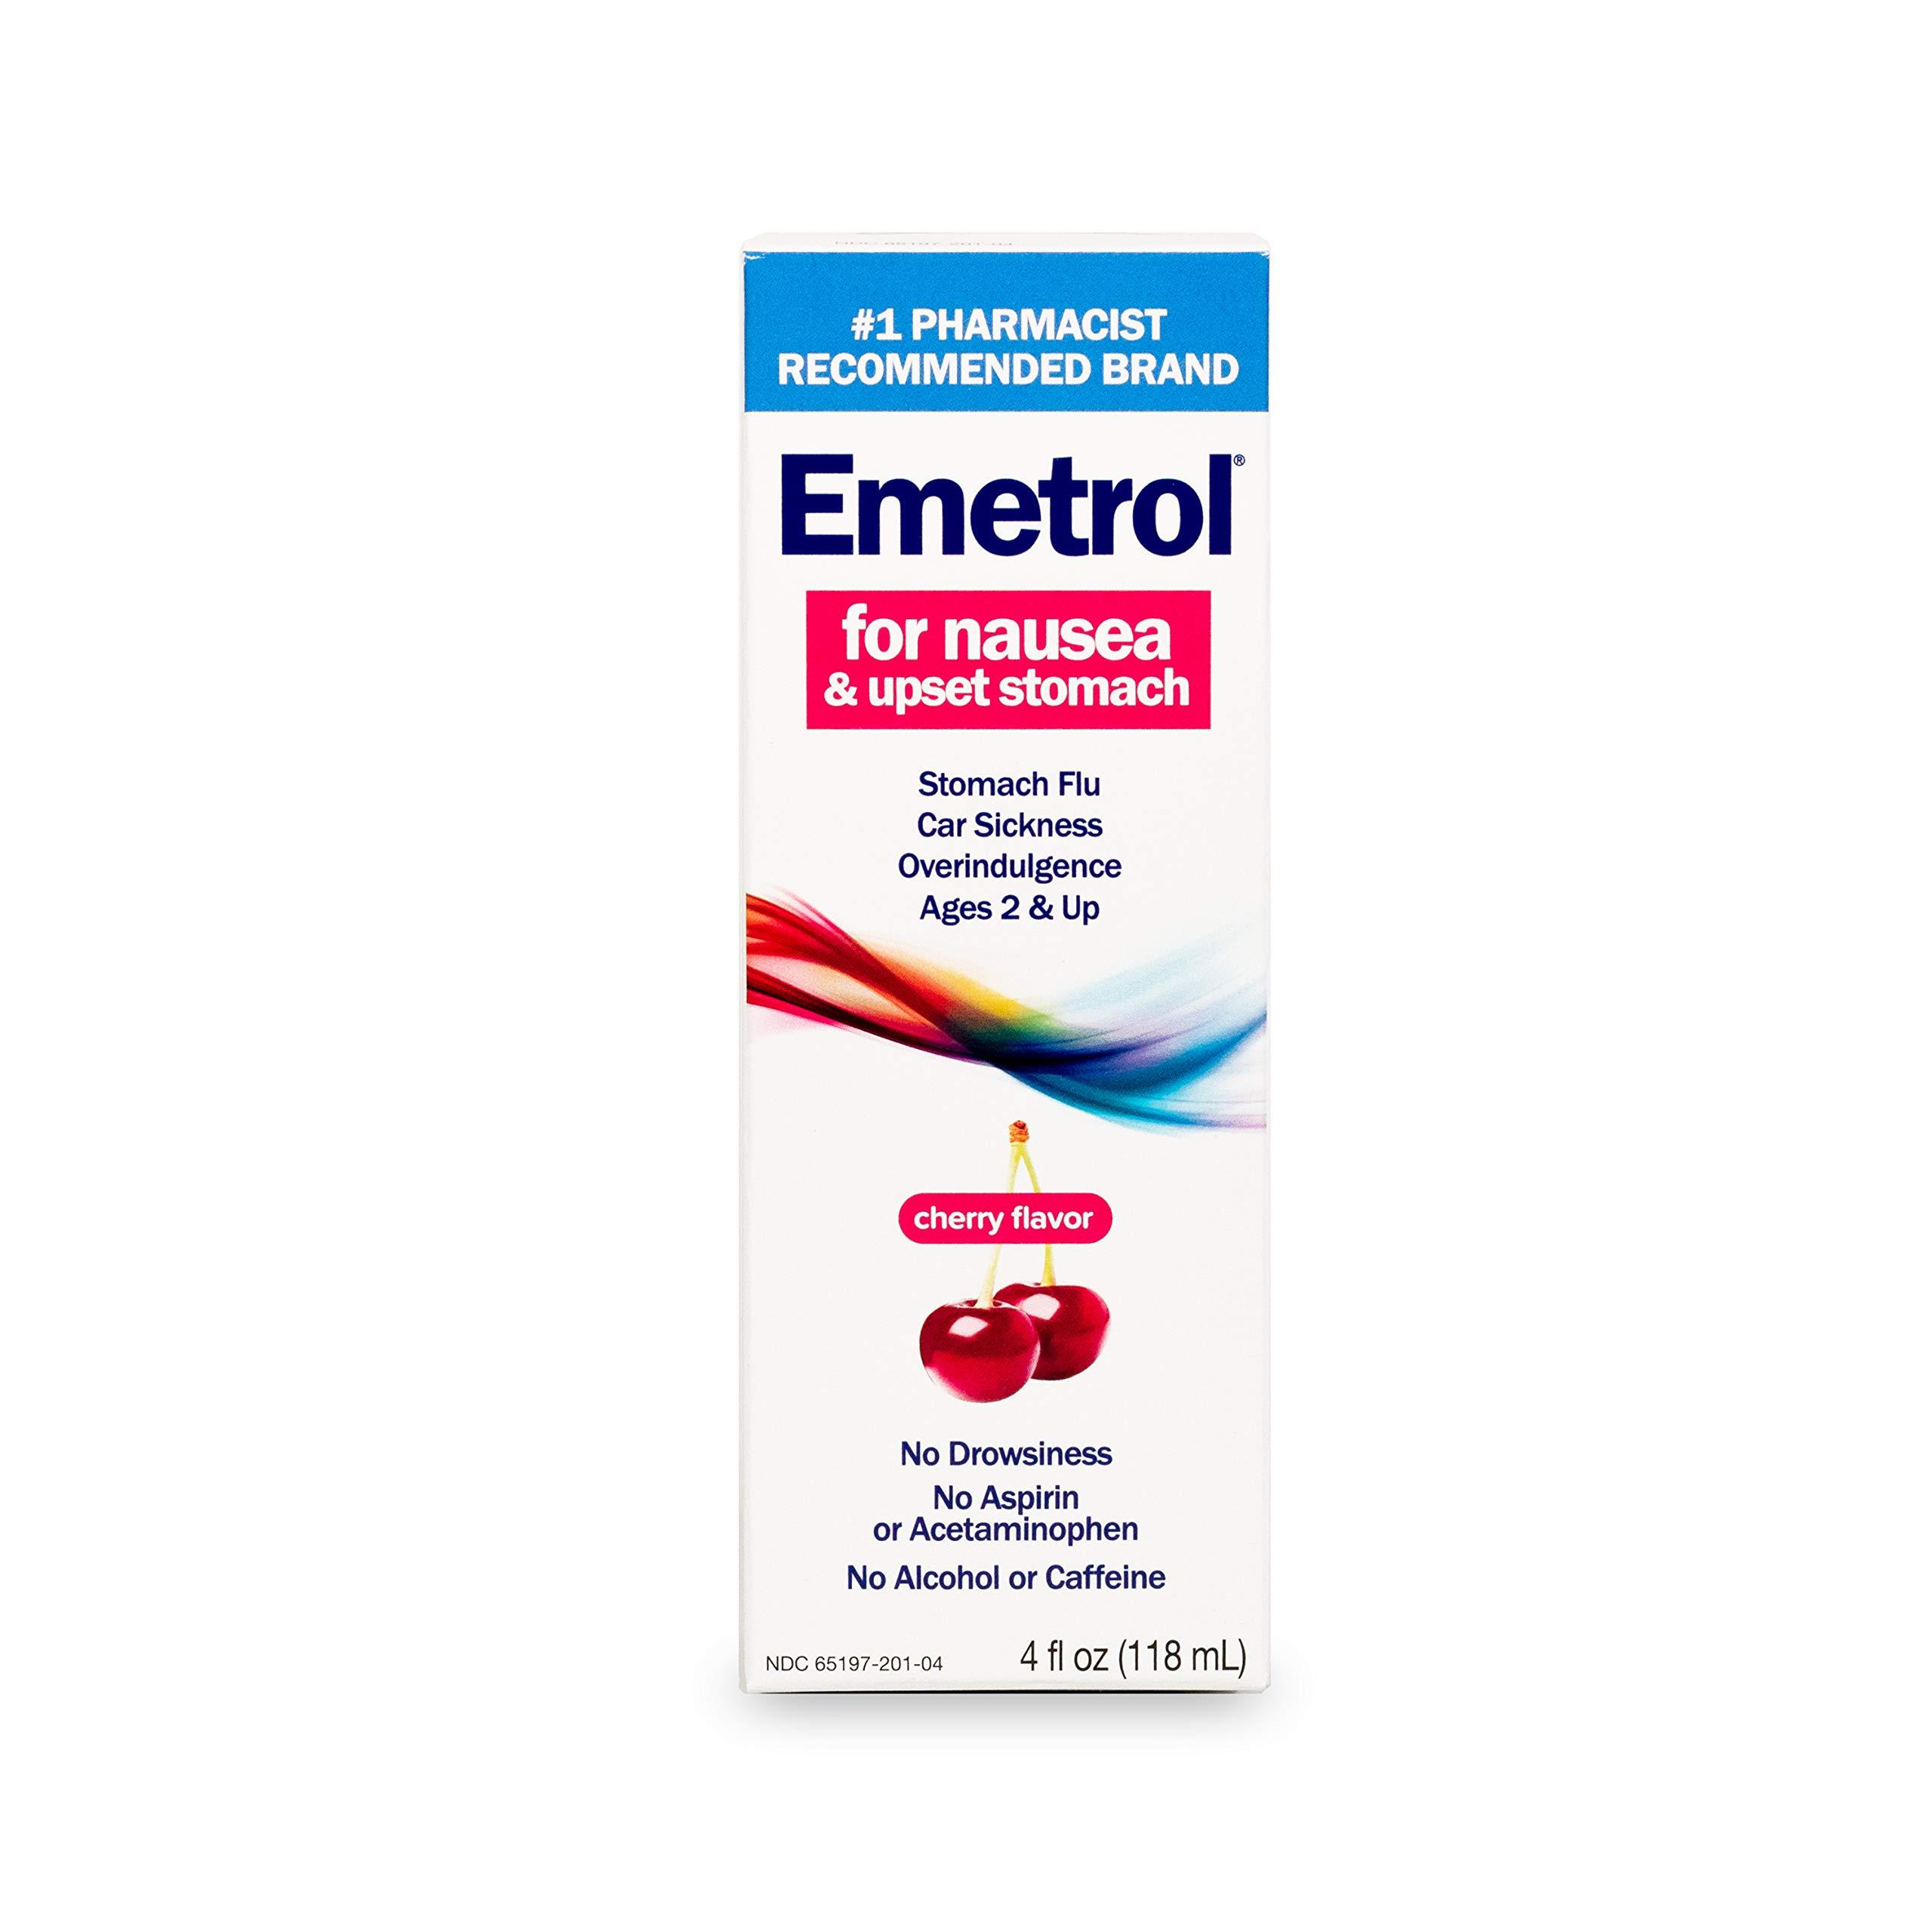 Emetrol Nausea and Upset Stomach Relief Liquid Medication, Cherry - 4 oz Bottle